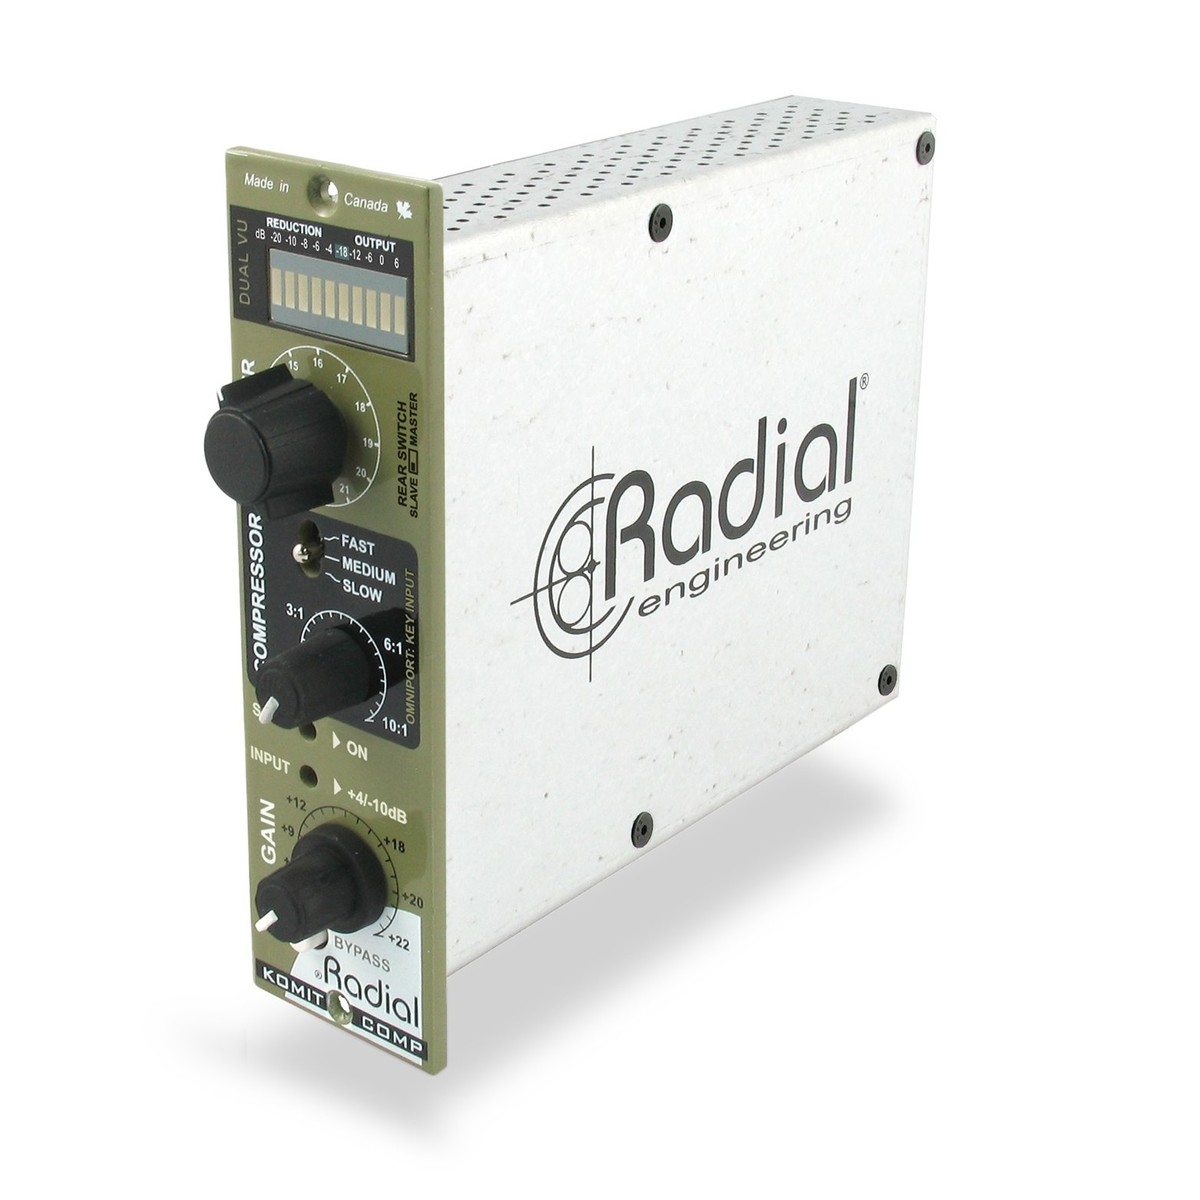 Radial Workhorse Komit 500 Compressor-Limiter